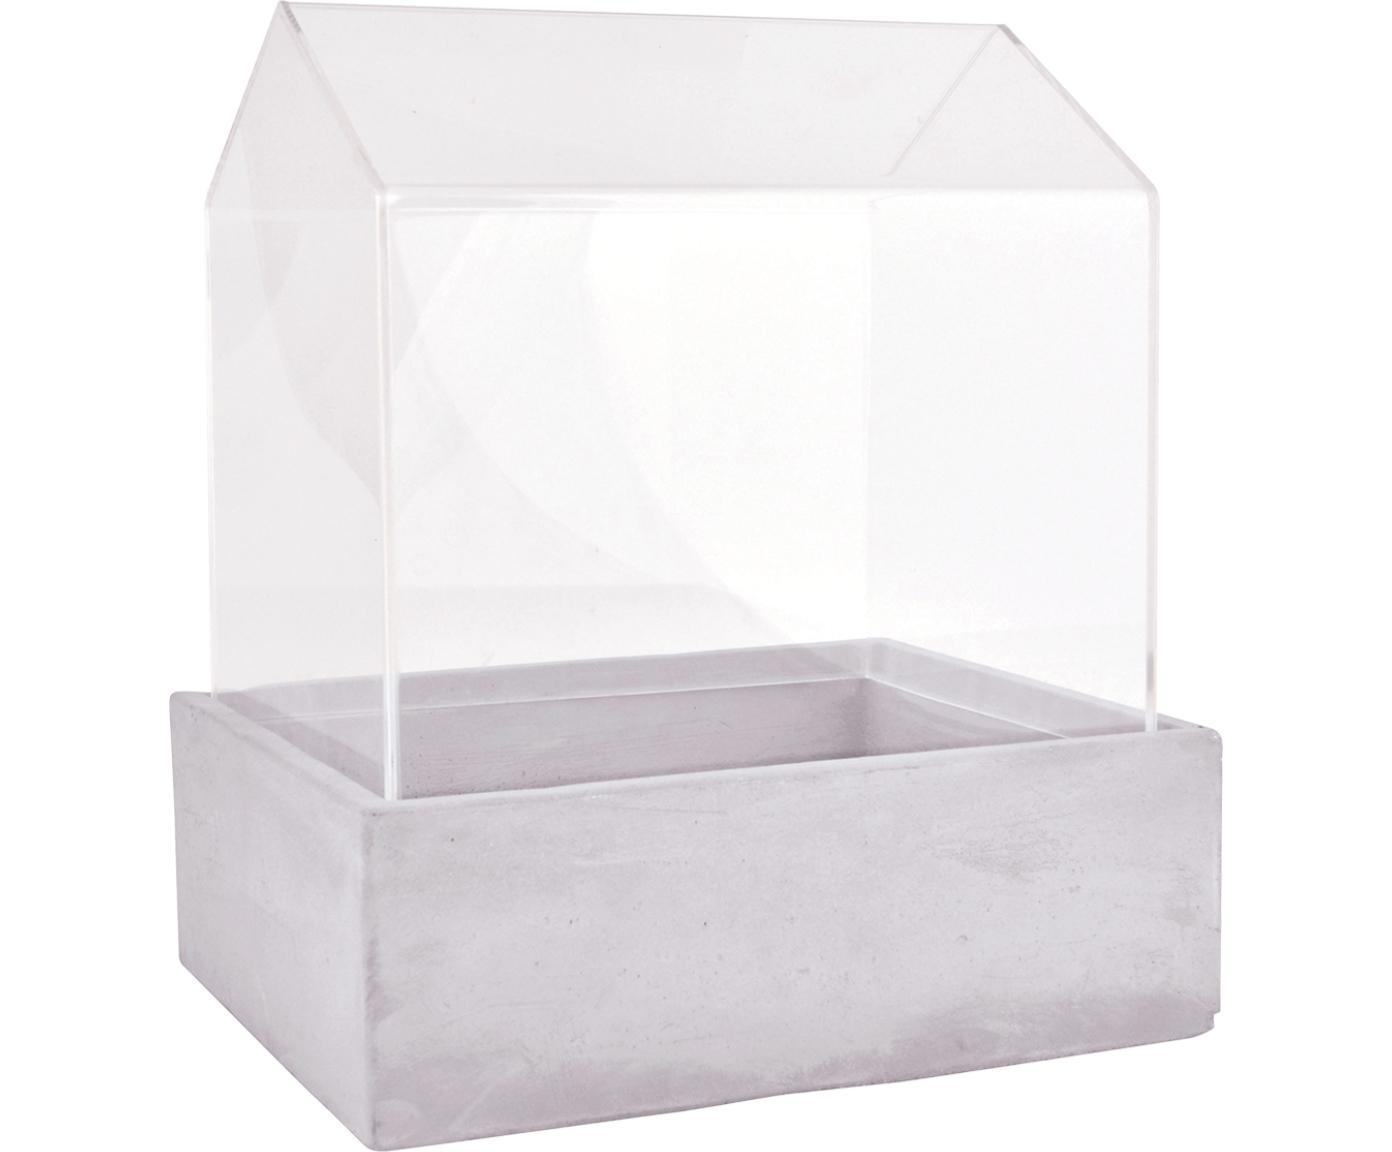 Mini-serra Budi, Cemento, vetro, Grigio trasparente, Larg. 24 x Alt. 28 cm